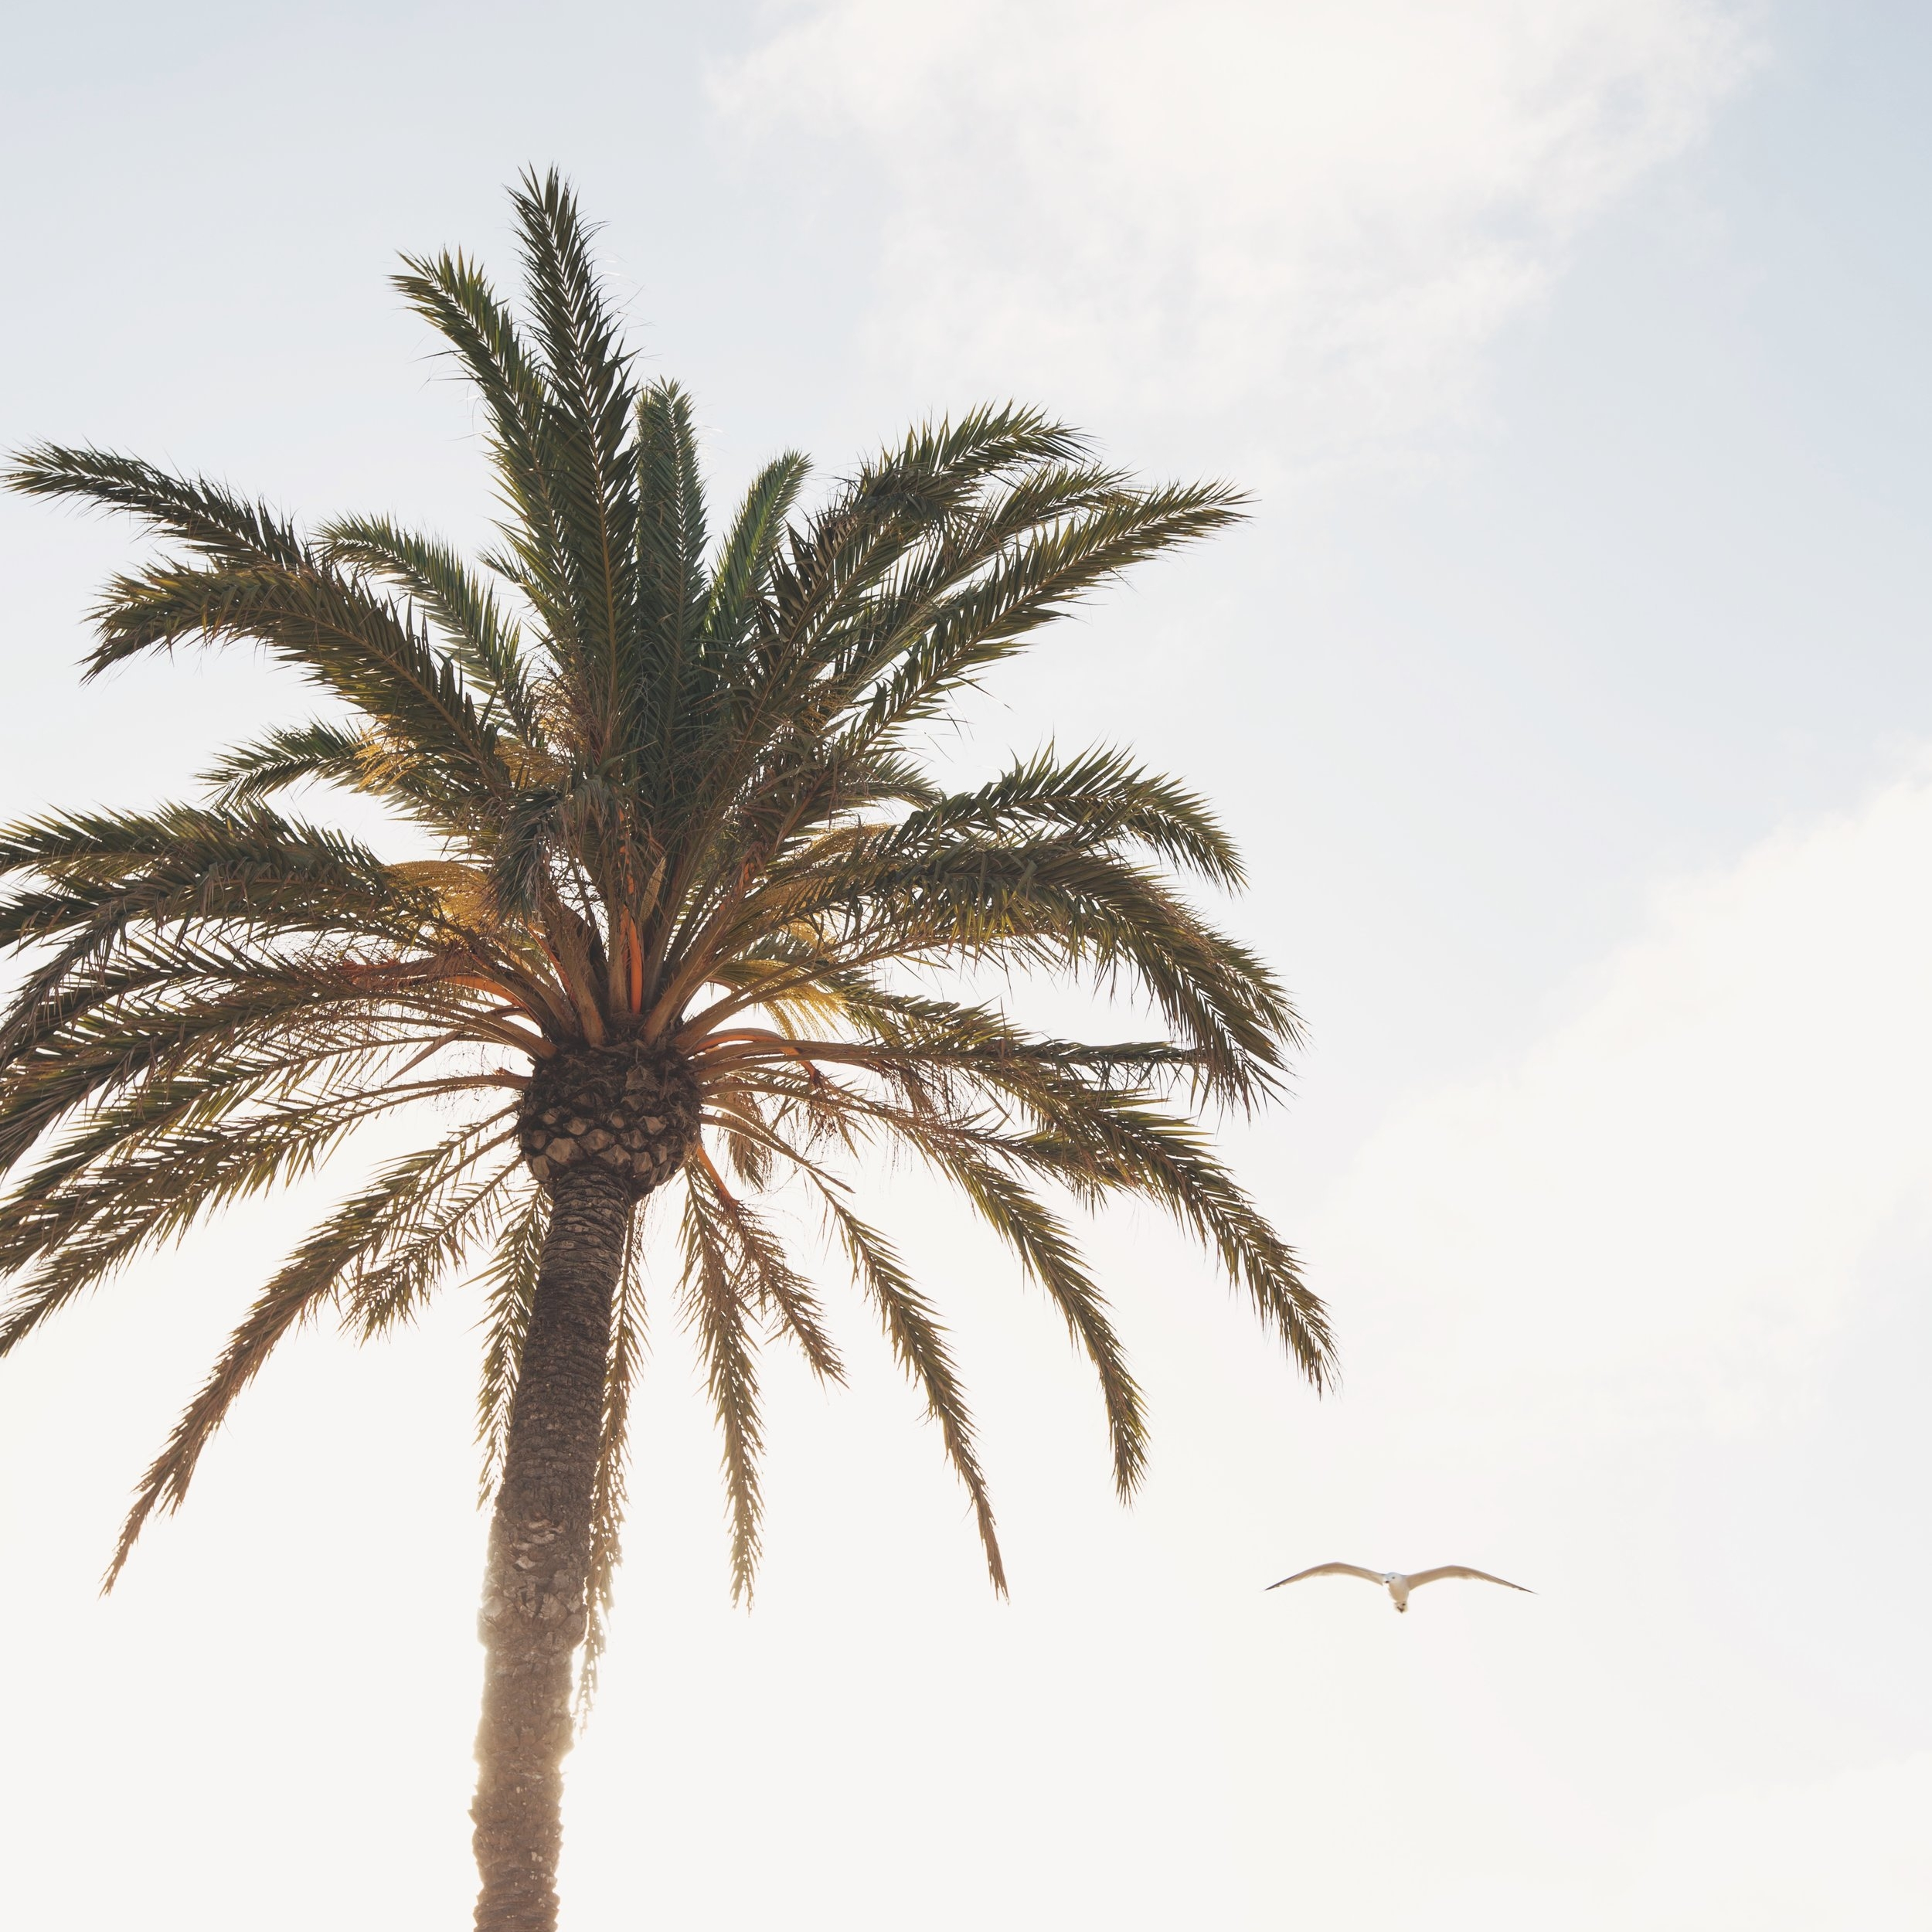 BEACHOUSE 2018-M-DB-029.jpg